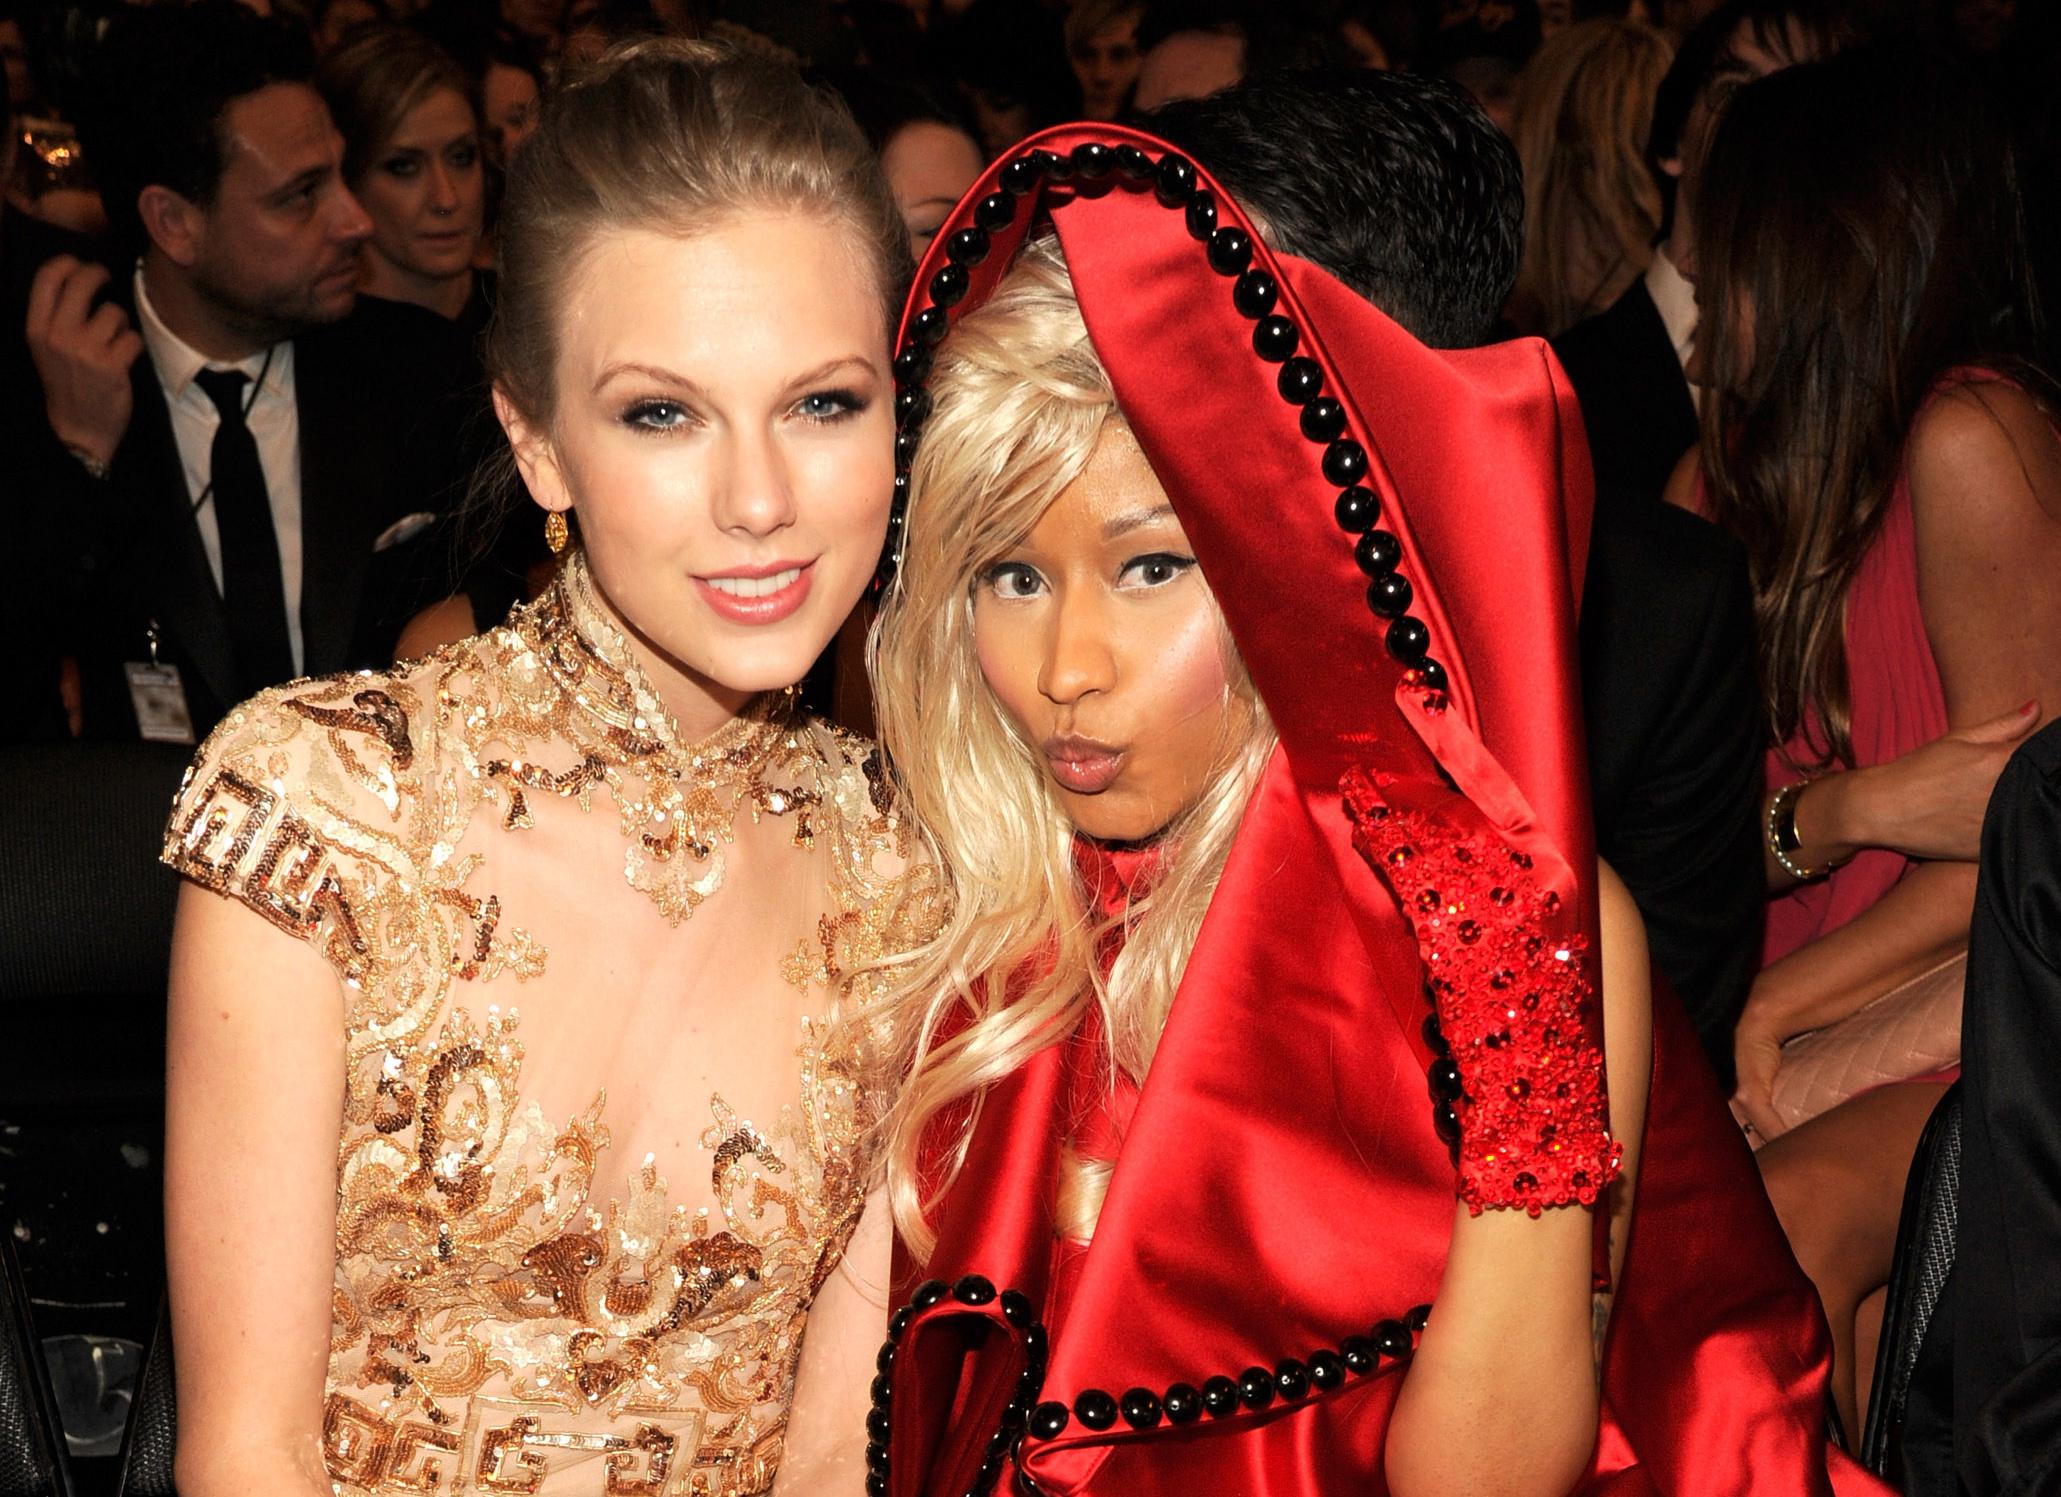 Nicki Minaj, Taylor Swift Set for Chart Battle